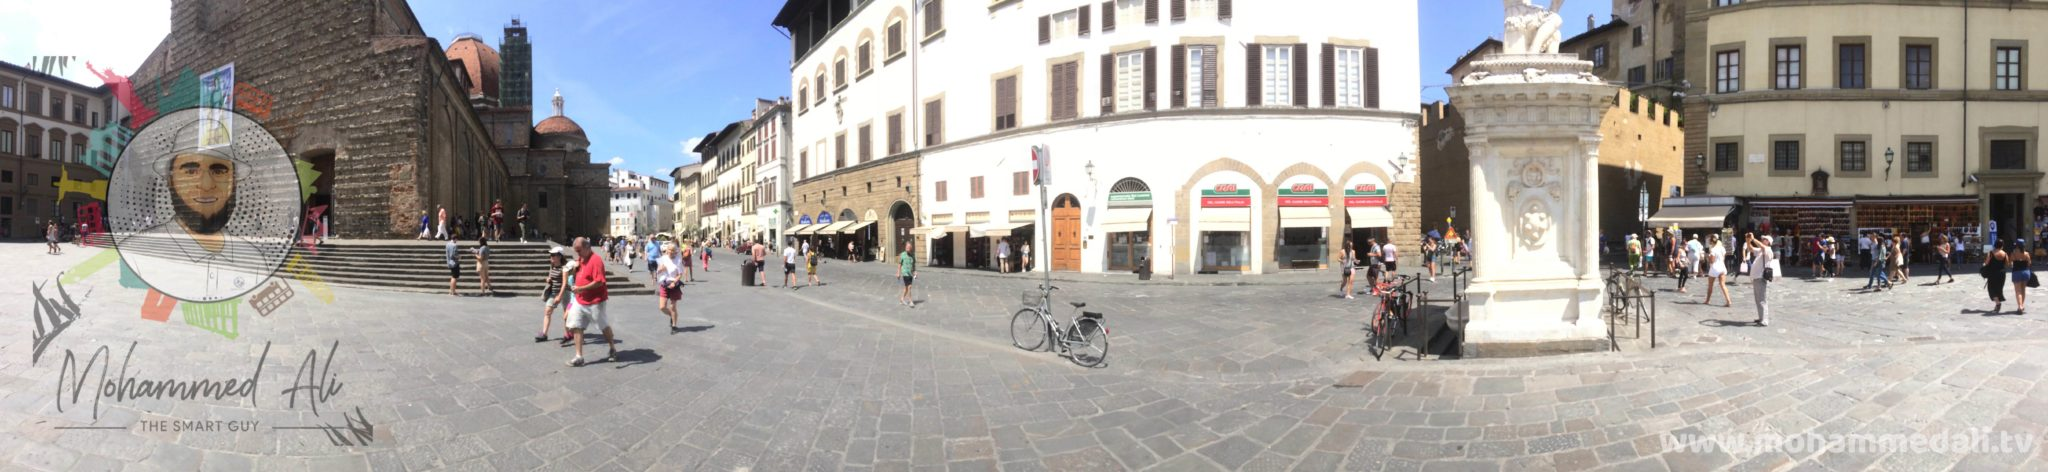 Panoramic view of Piazza della Signoria in Florence